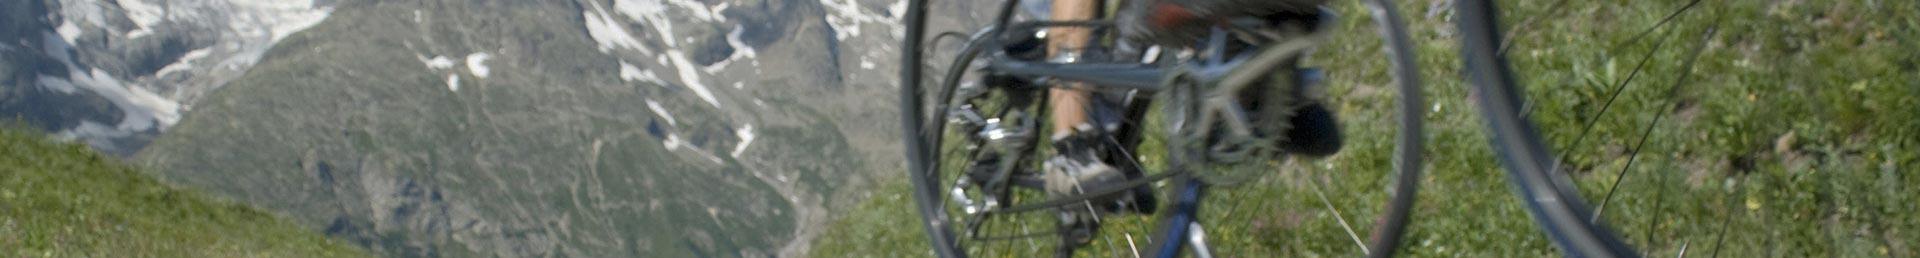 Vélo / VTT Hautes-Alpes